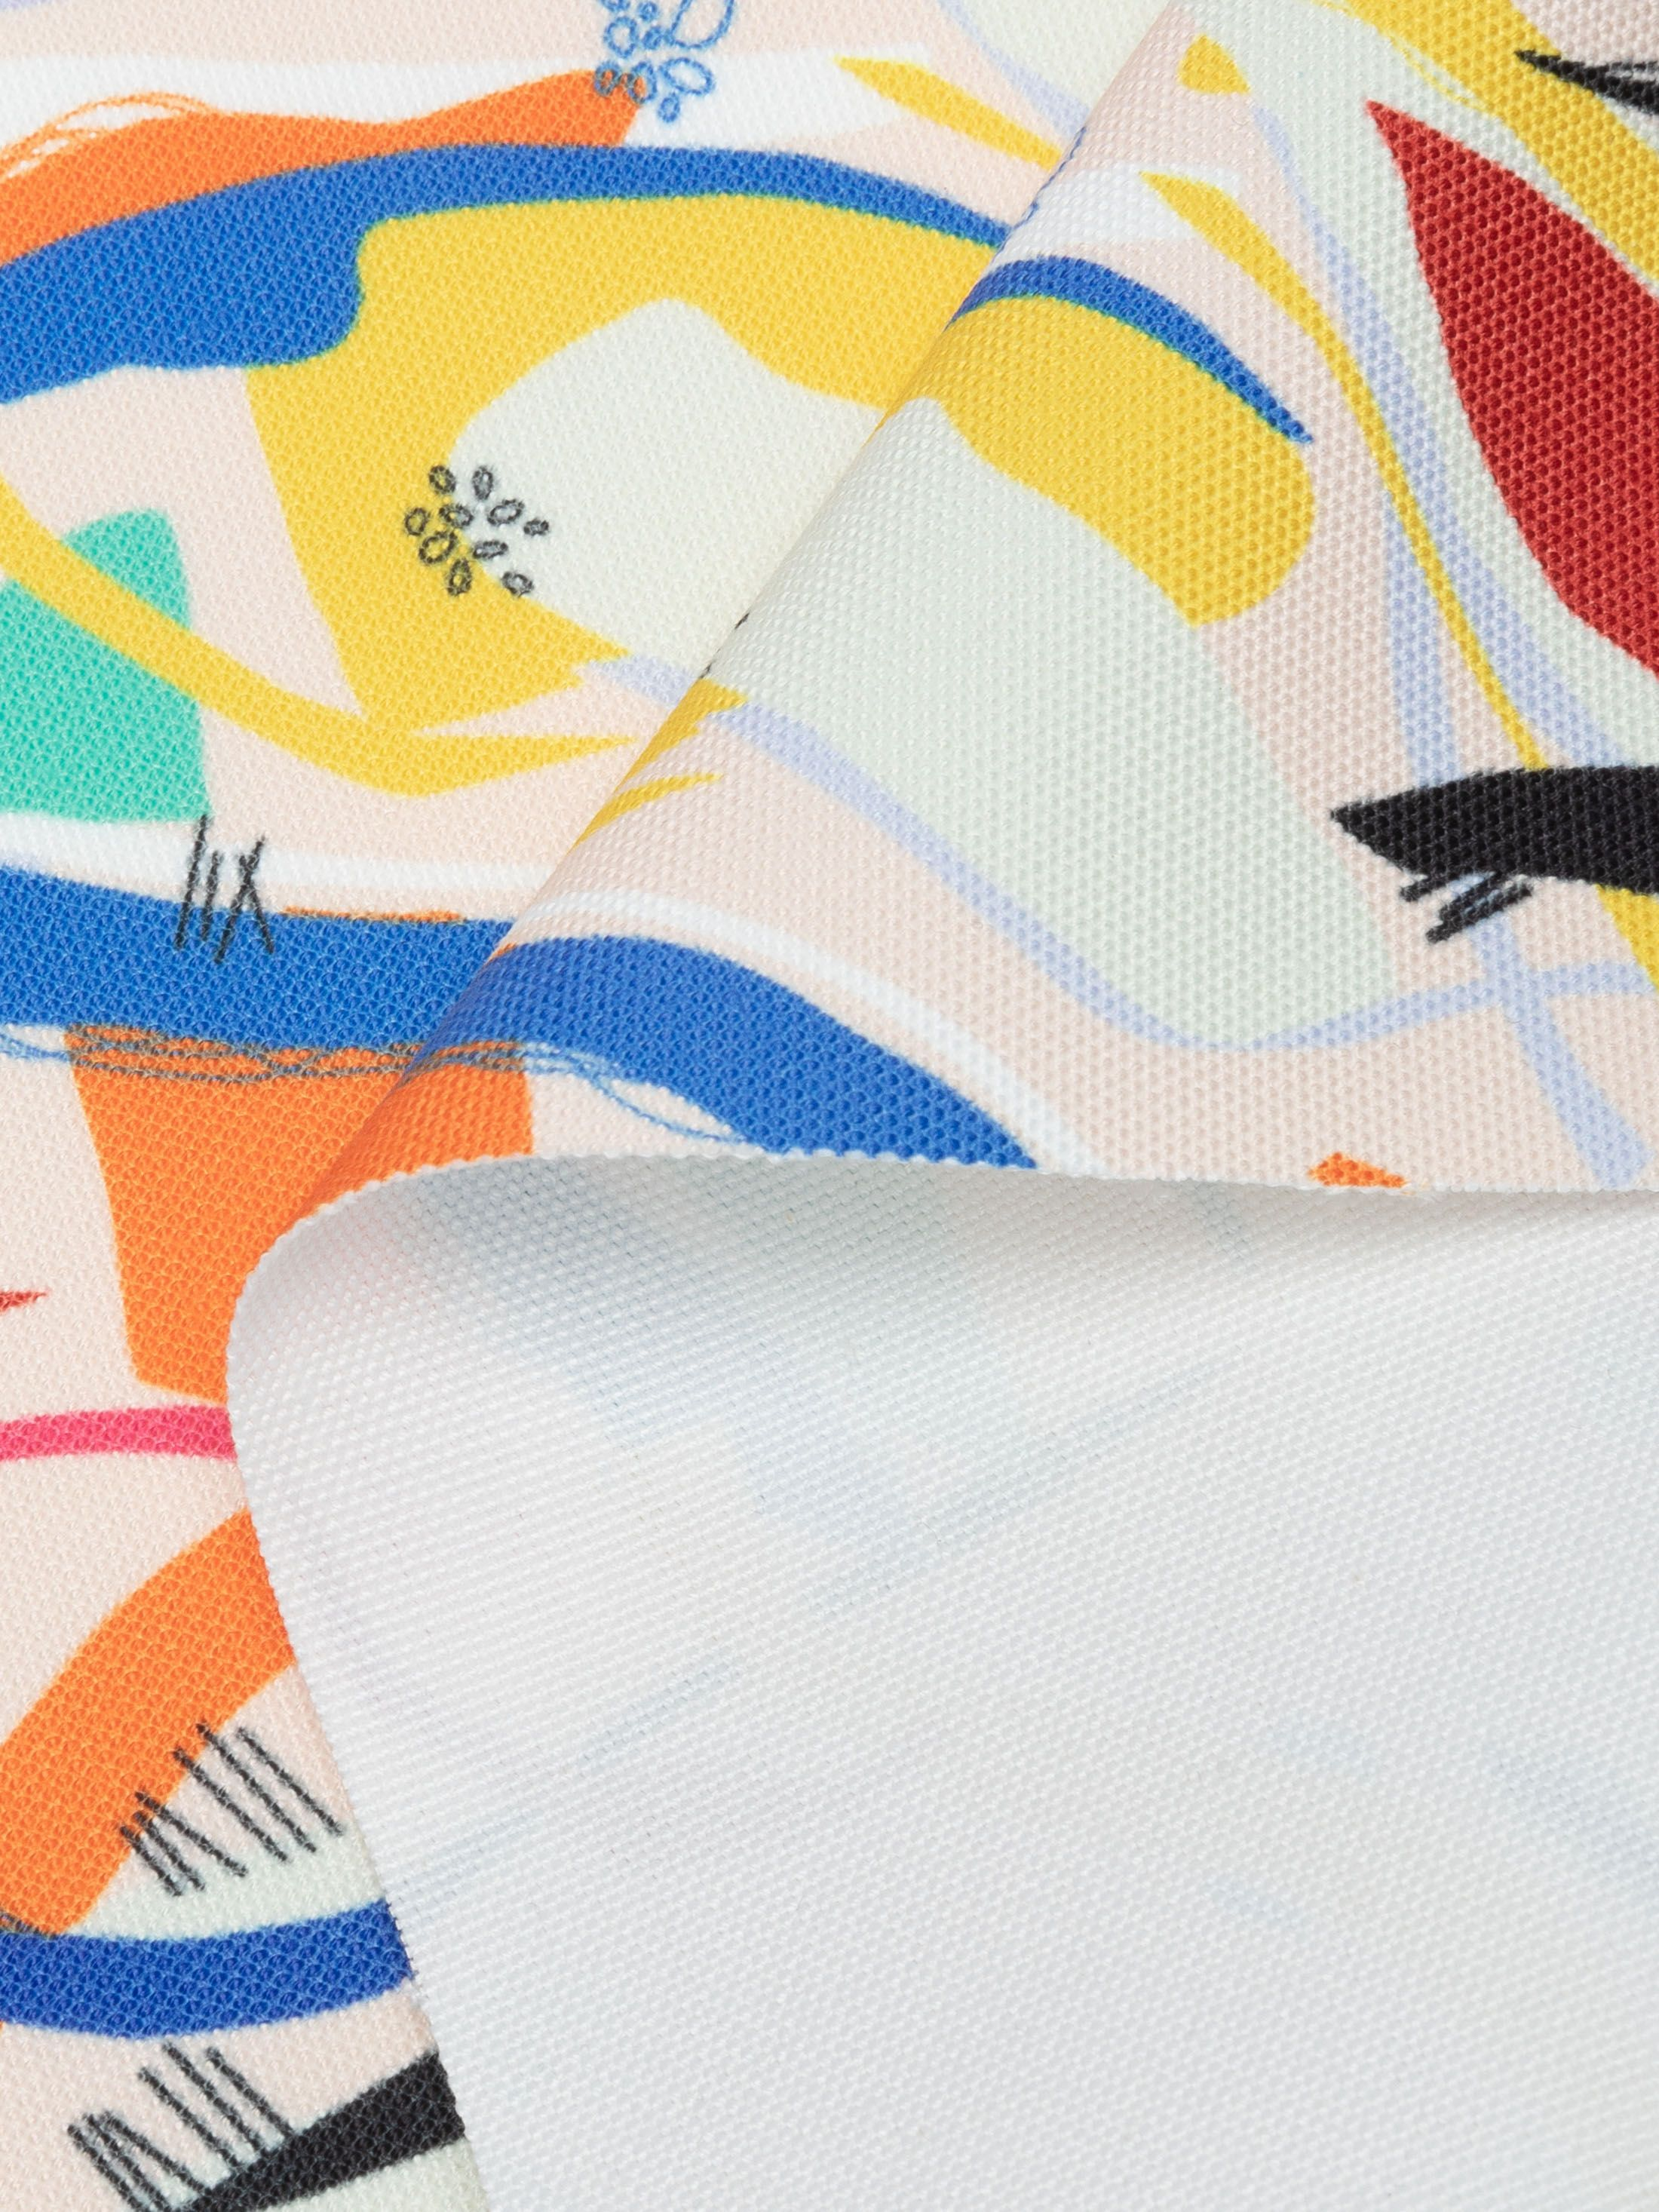 sailor's canvas printing